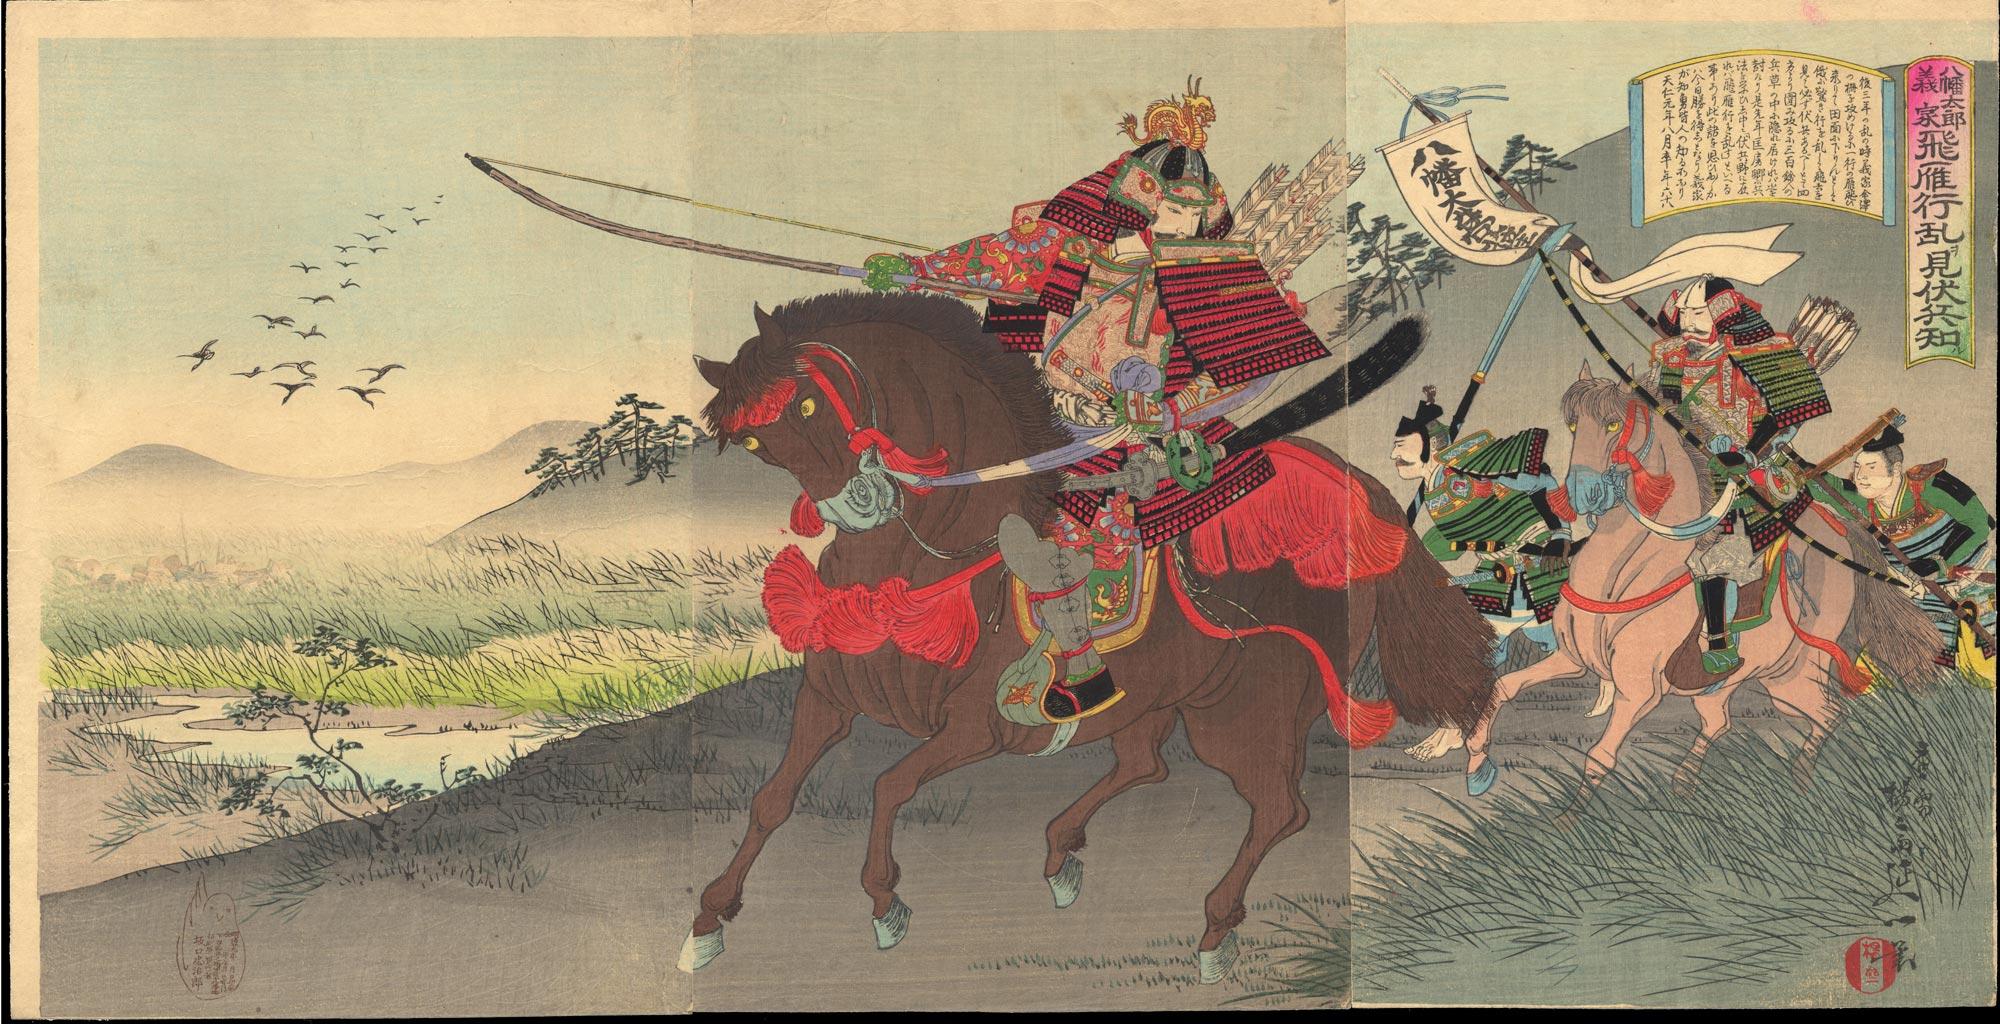 The Battle of Go-San-Nen